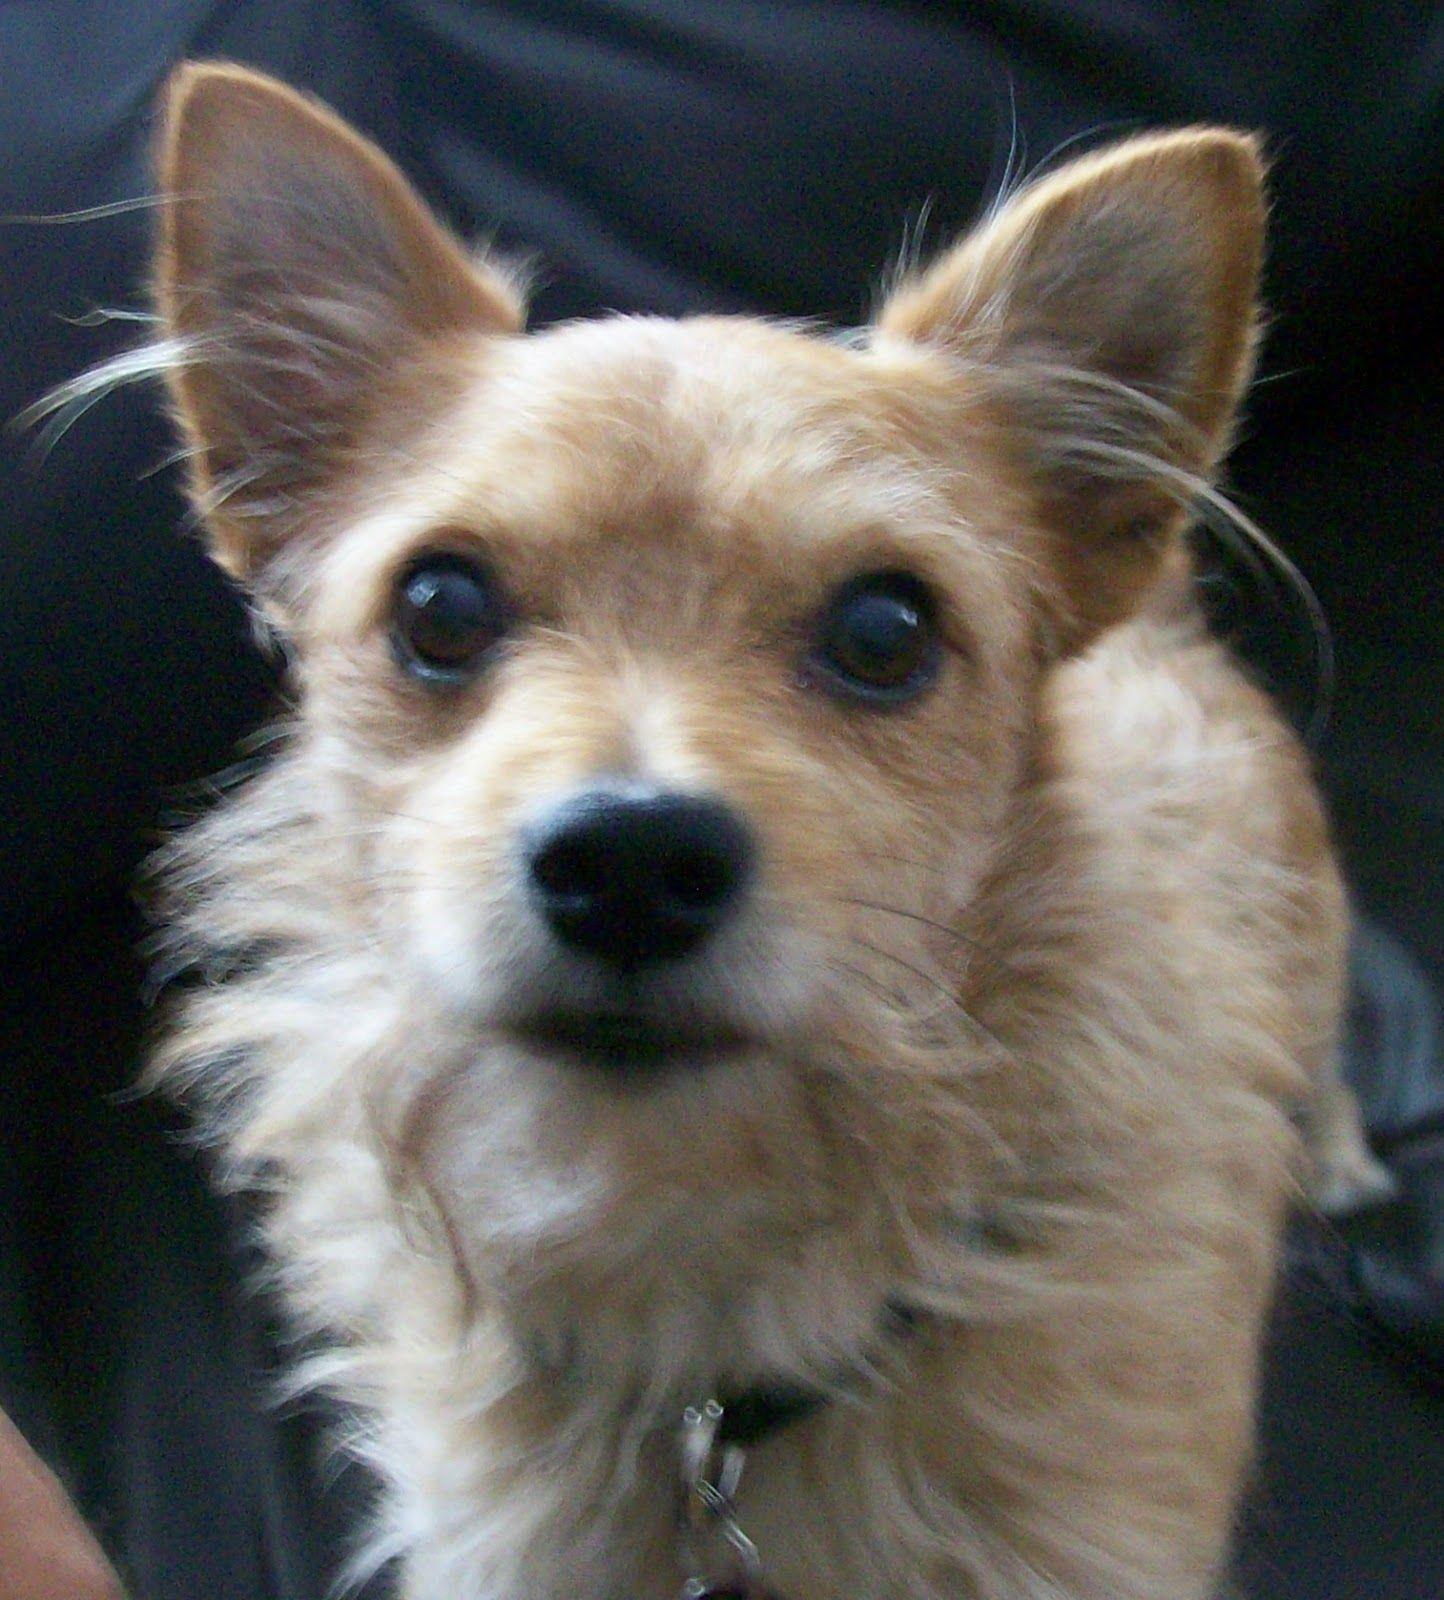 Pics photos dachshund chihuahua dog mix dogs pictures photos pics - Chihuahua Yorkie Mix Dogs Looks Just Like Pnut